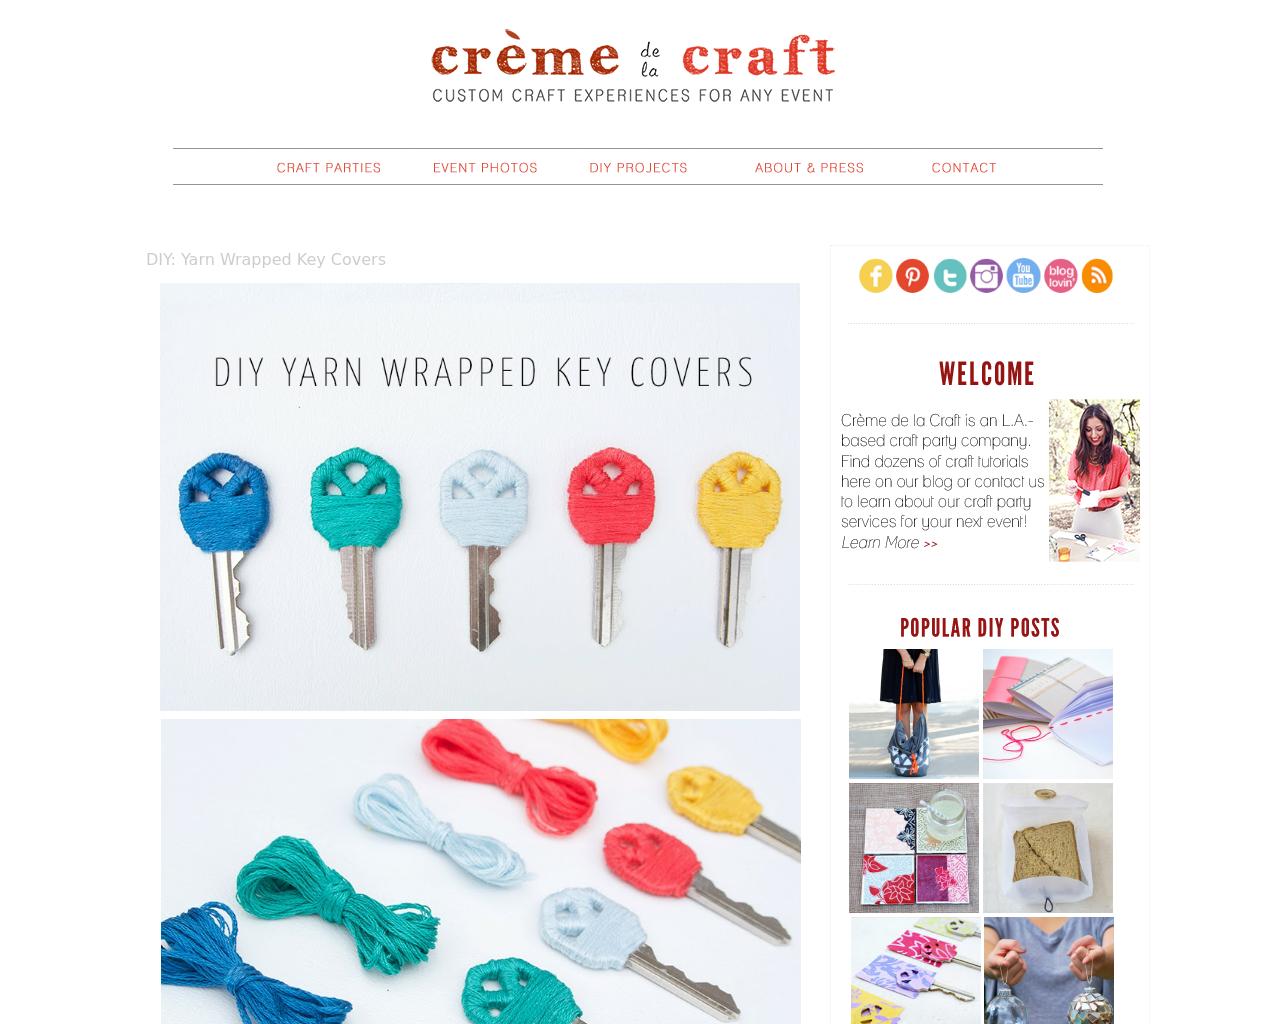 creme-de-la-craft-Advertising-Reviews-Pricing